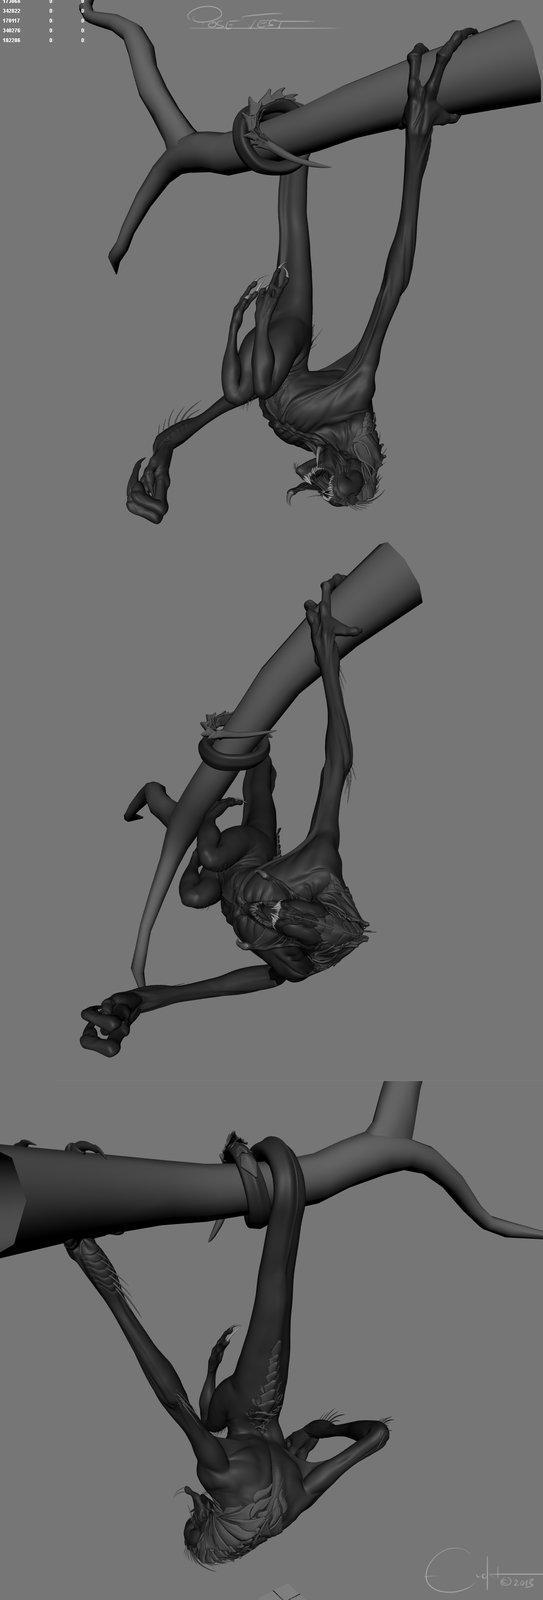 Shrieker - Rig / Pose test